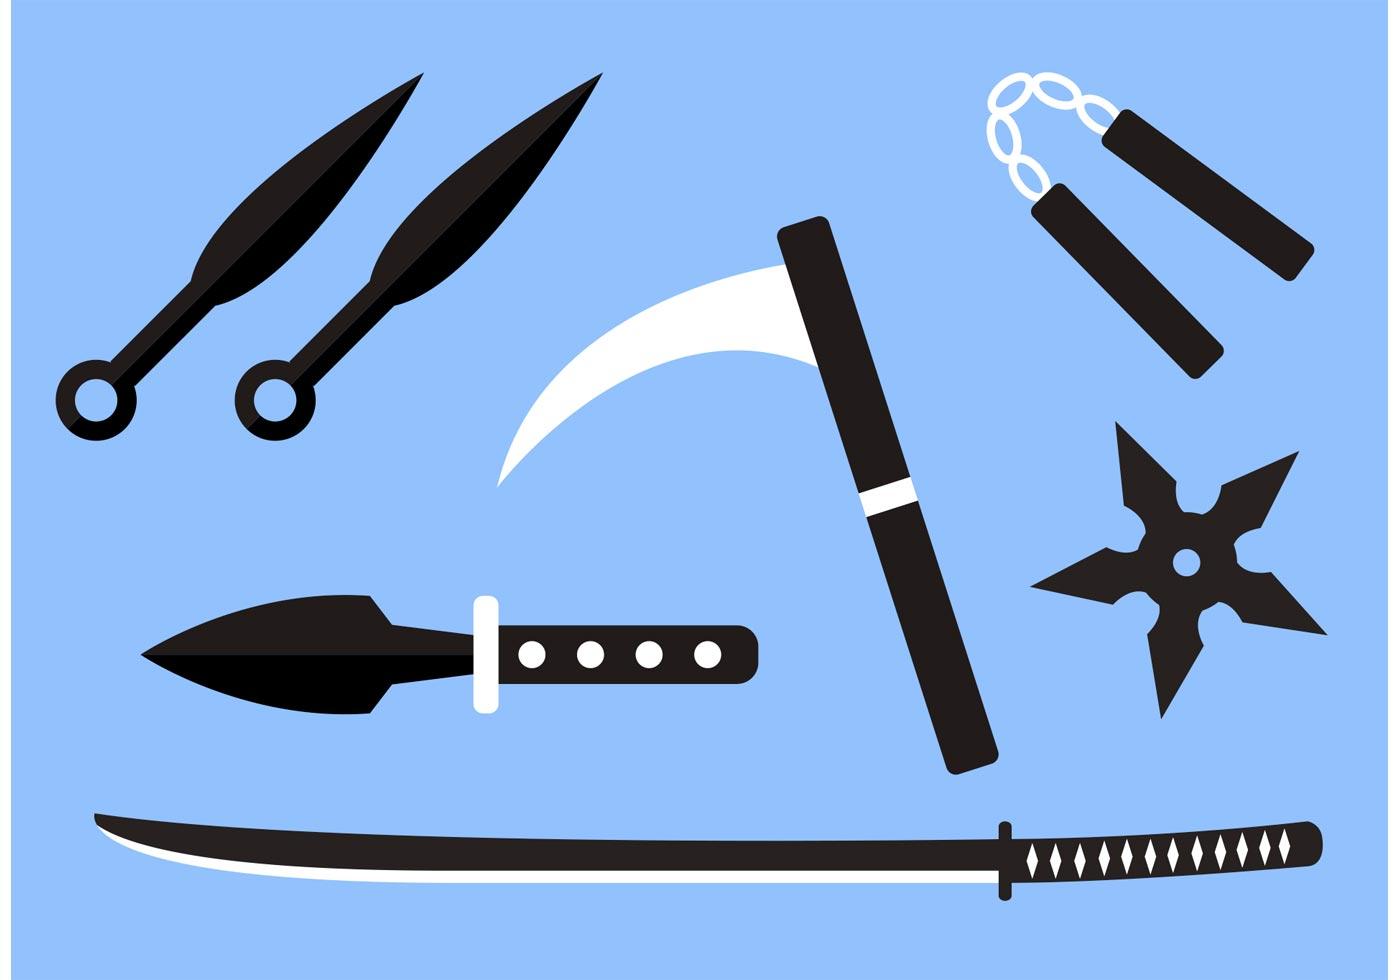 Картинки оружие ниндзя и самураев